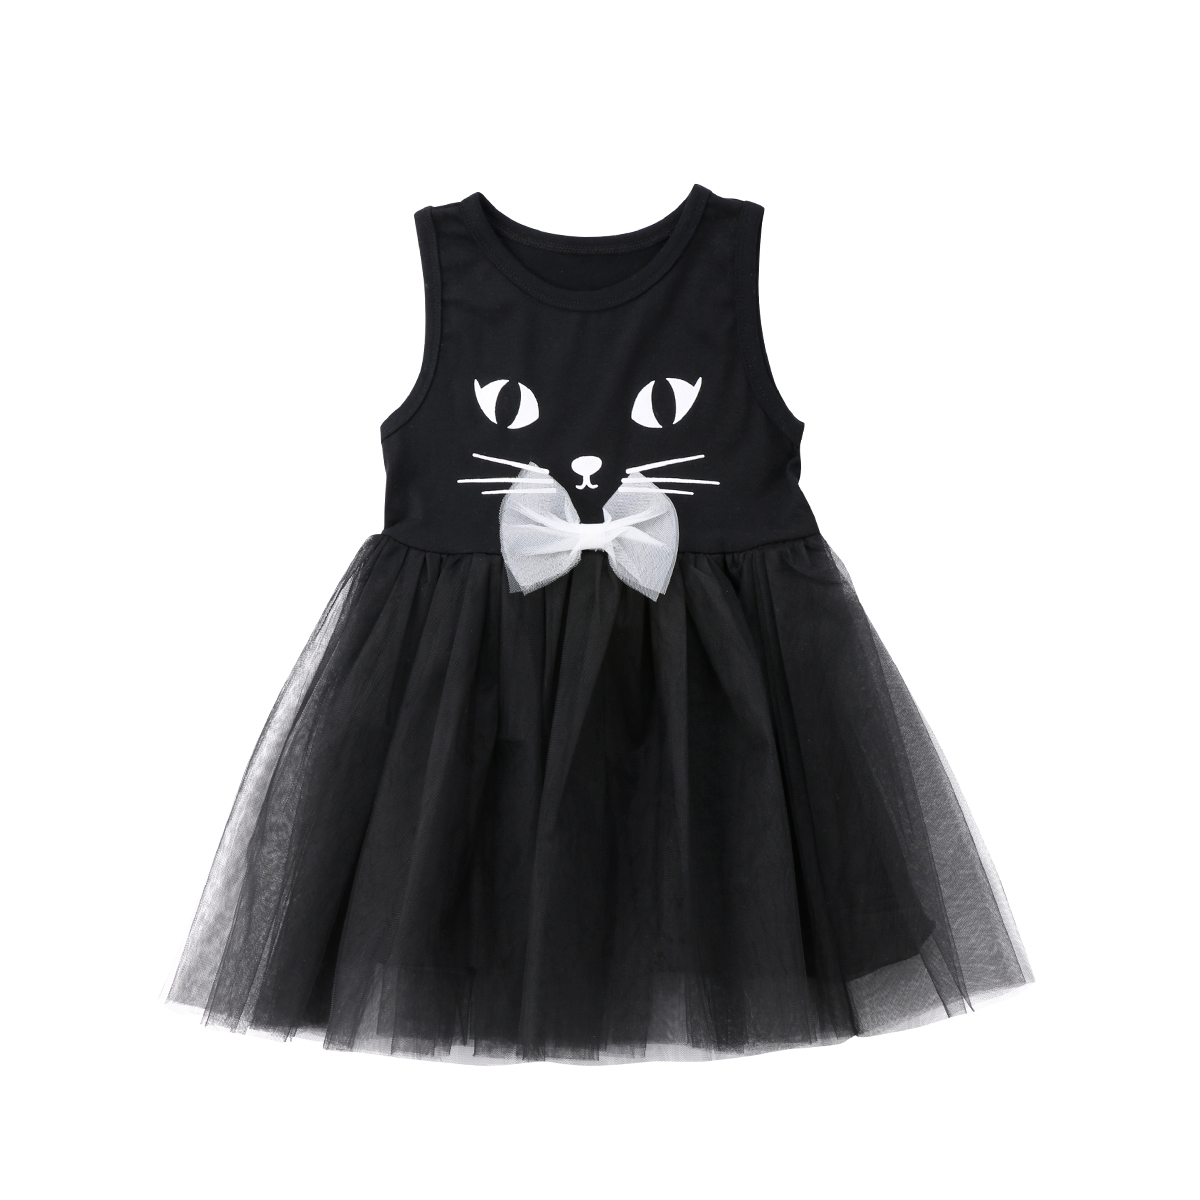 Dresses Princess-Dress Formal Girl Tutu Lace Party Wedding-Pageant Cat 3D Kid Size-2-7t